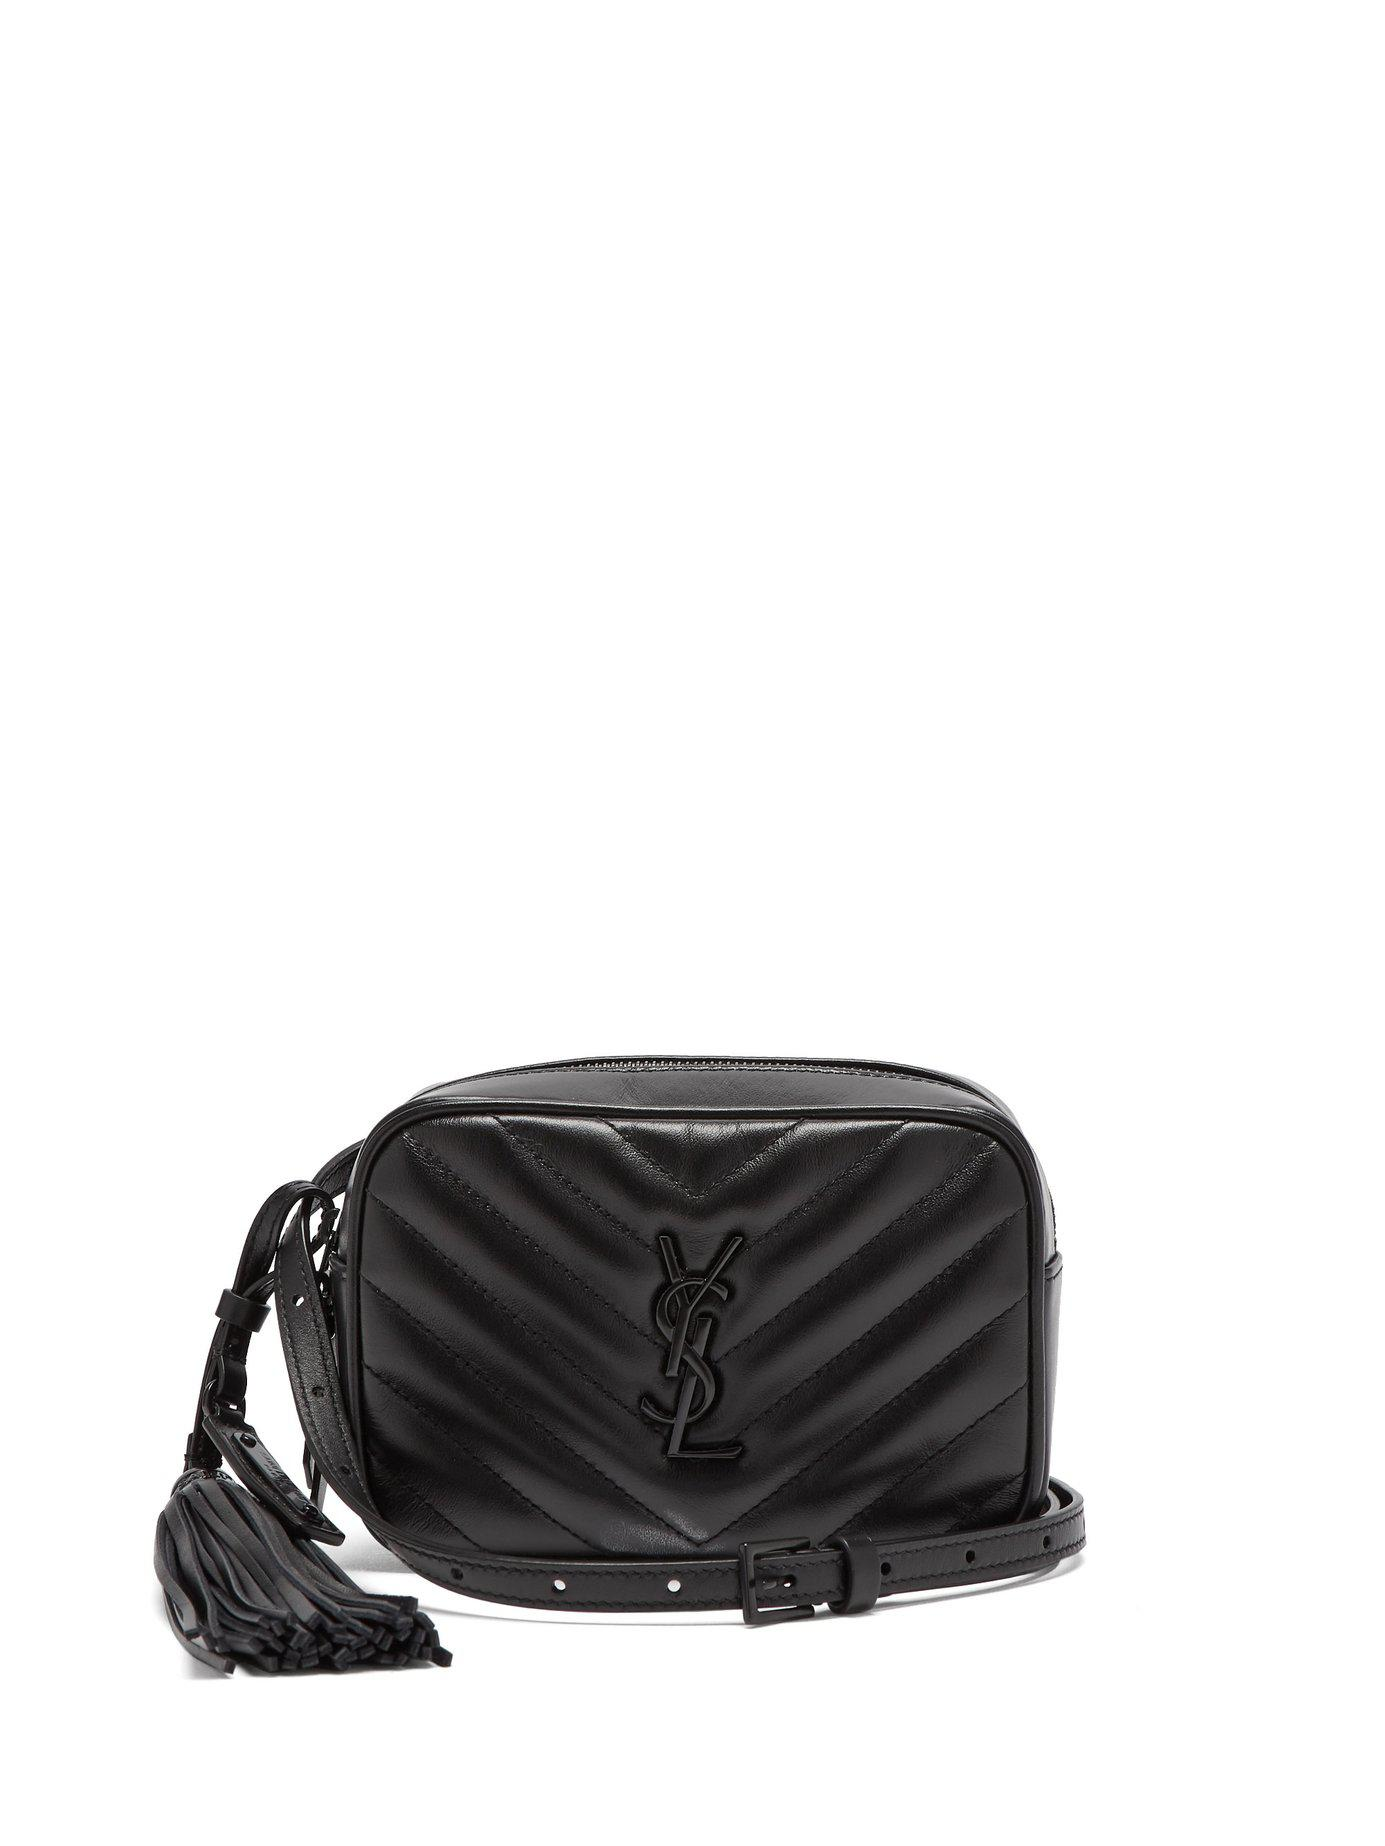 0c3256148ab7 Lyst - Saint Laurent Lou Chevron Quilted Leather Belt Bag in Black